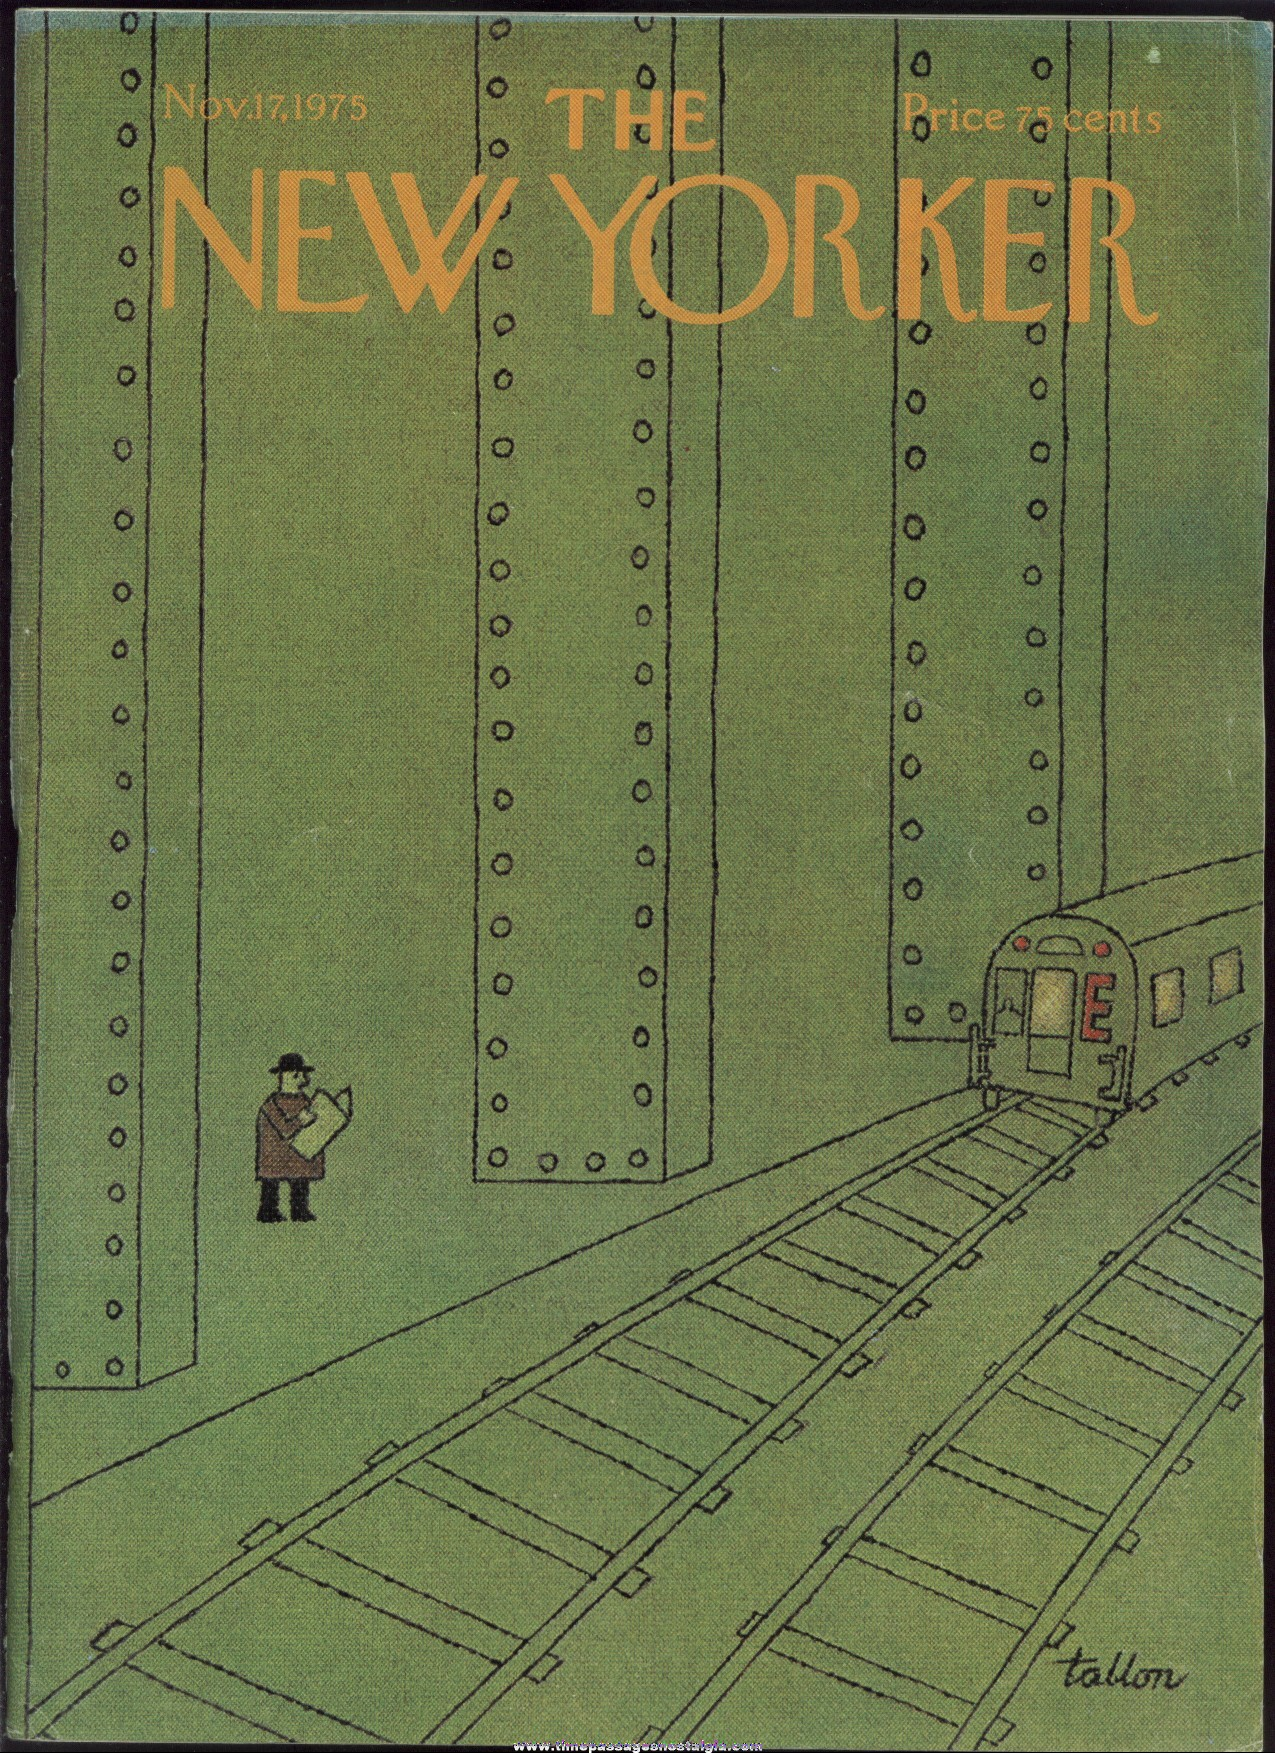 New Yorker Magazine - November 17, 1975 - Cover by Robert Tallon